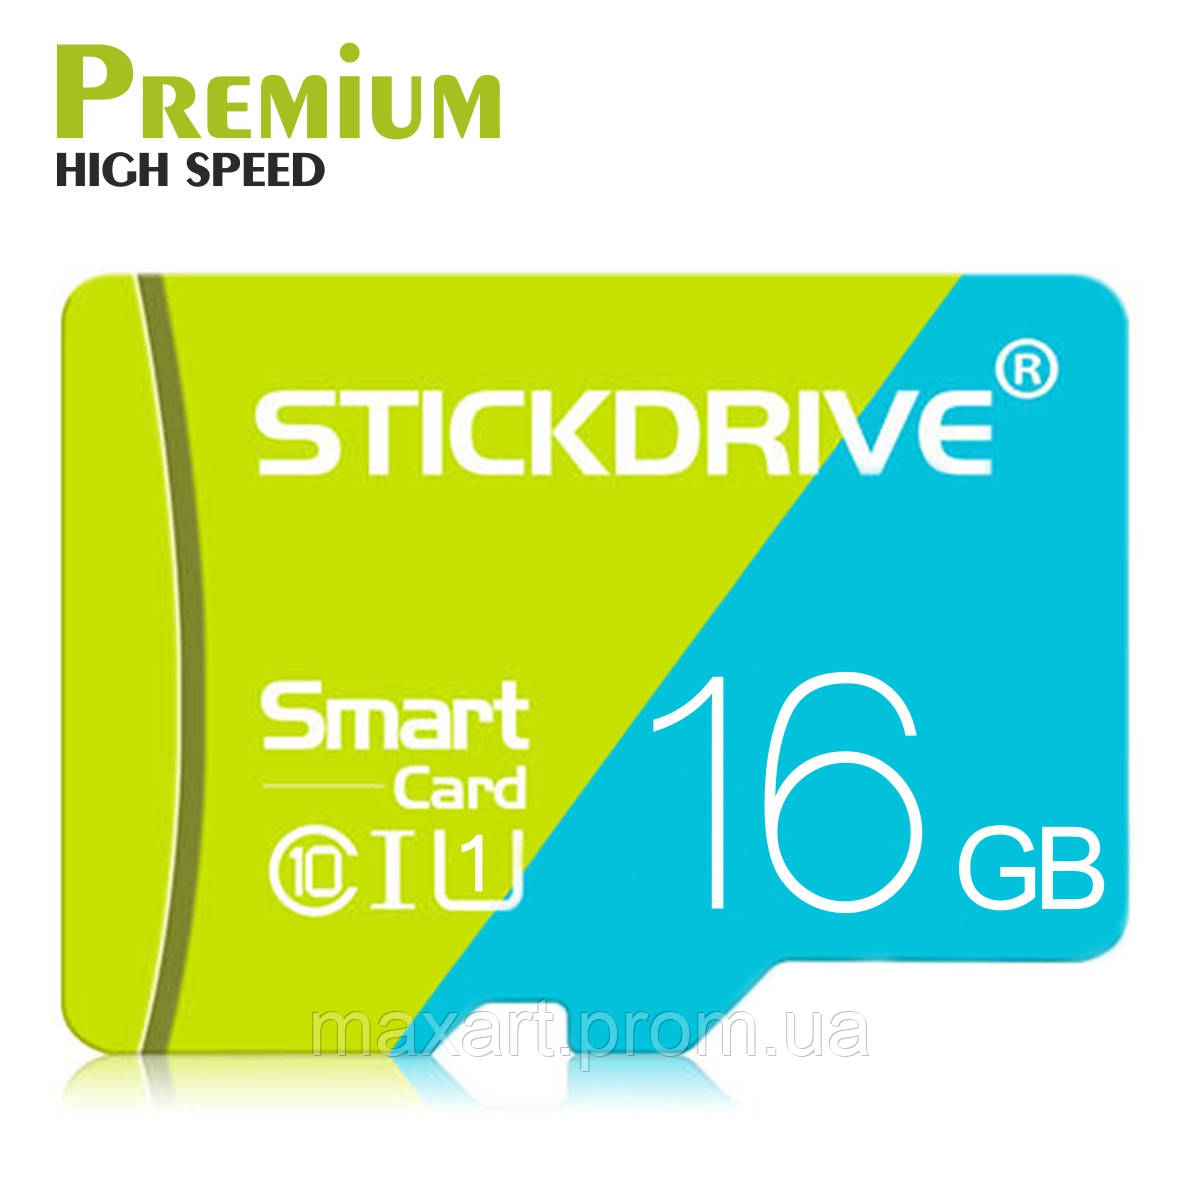 Карта памяти microSD Premium STICKDRIVE (GB U1016) 16 GB, class U1